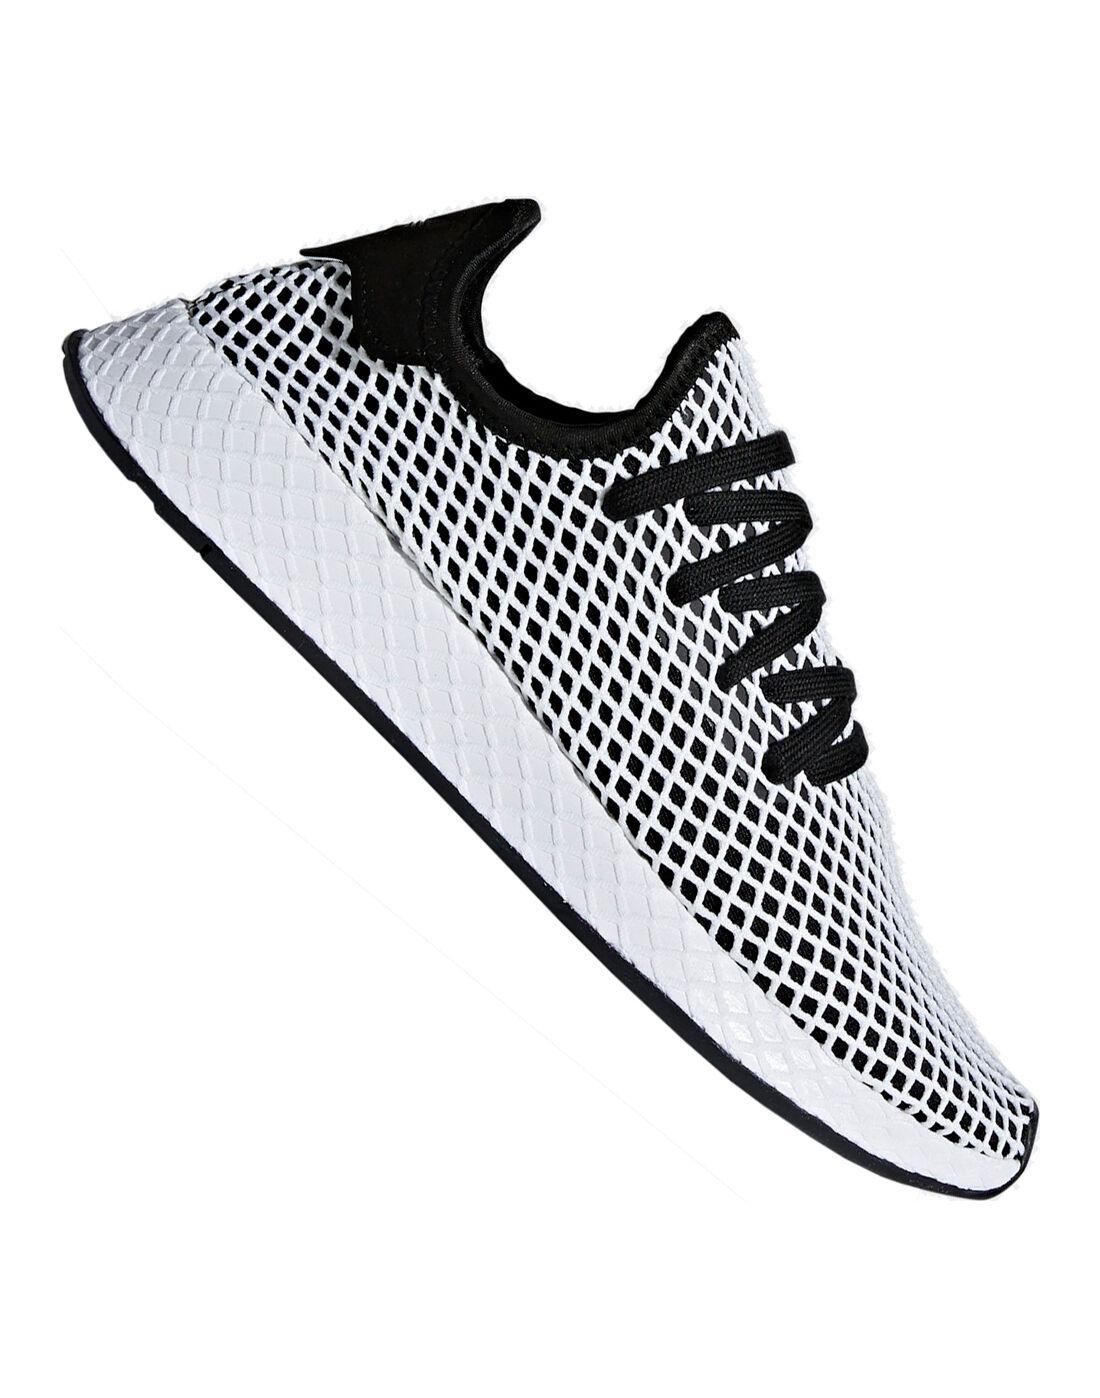 Men's adidas Originals Deerupt   Black